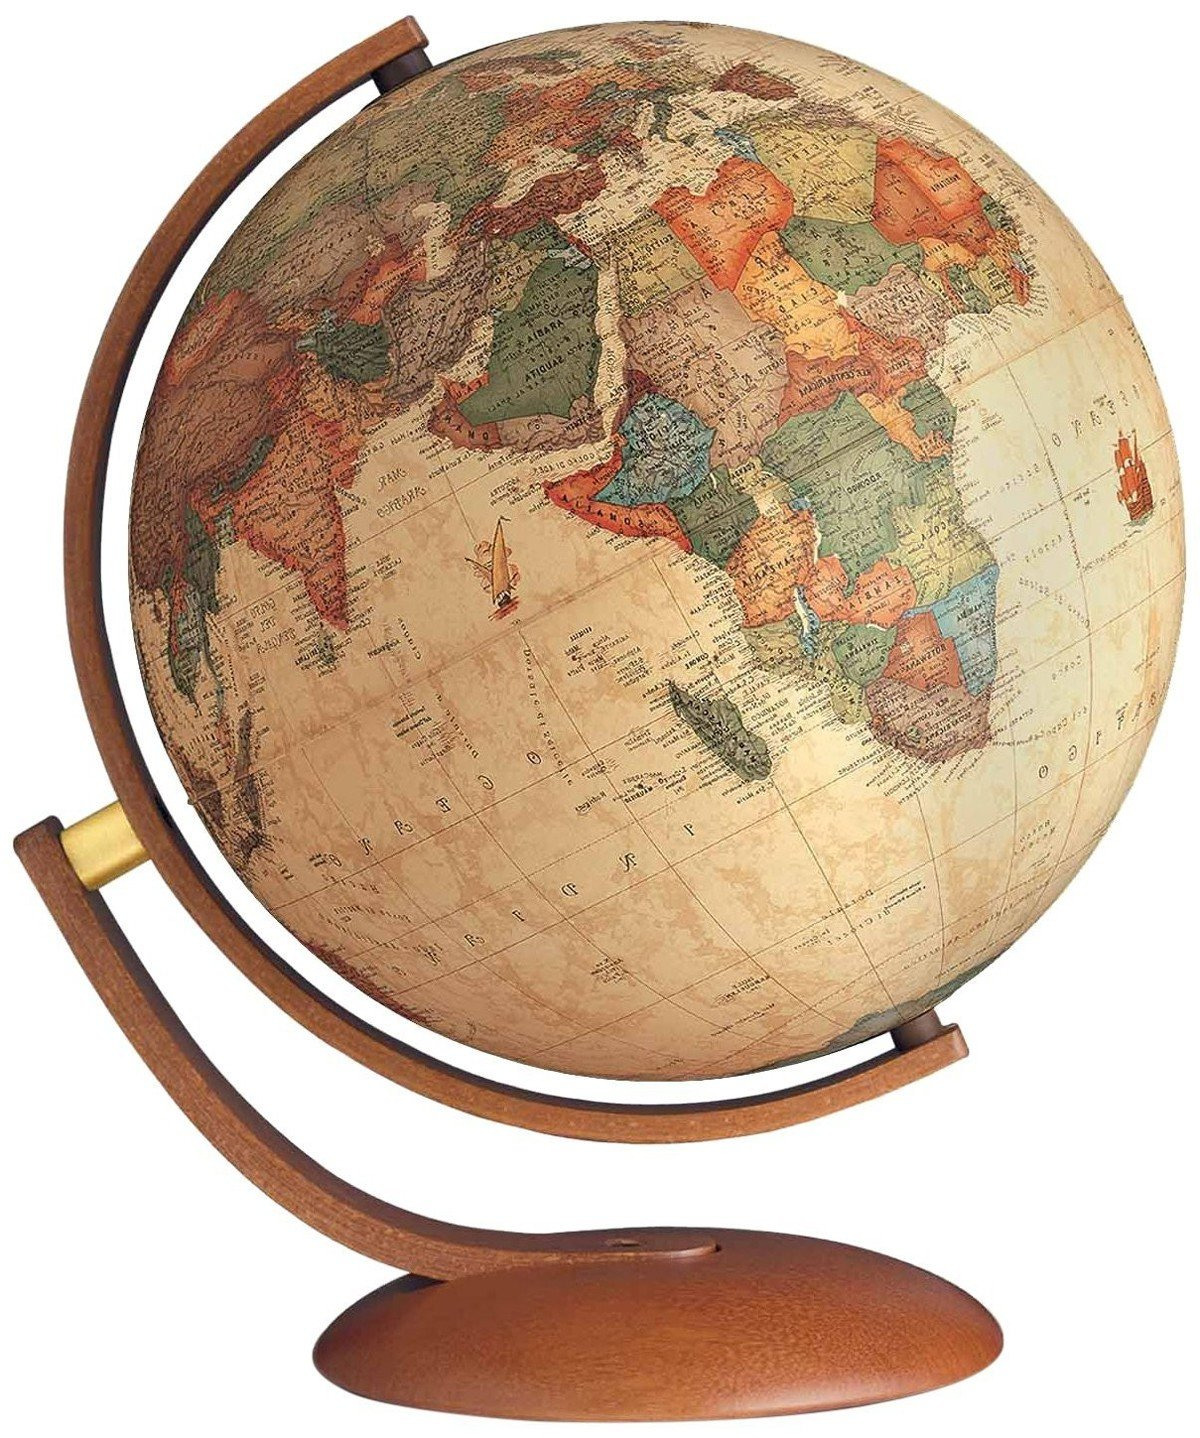 Mappemonde Optimus 30cm, Nova Rico 0330OPANITLLL0R0